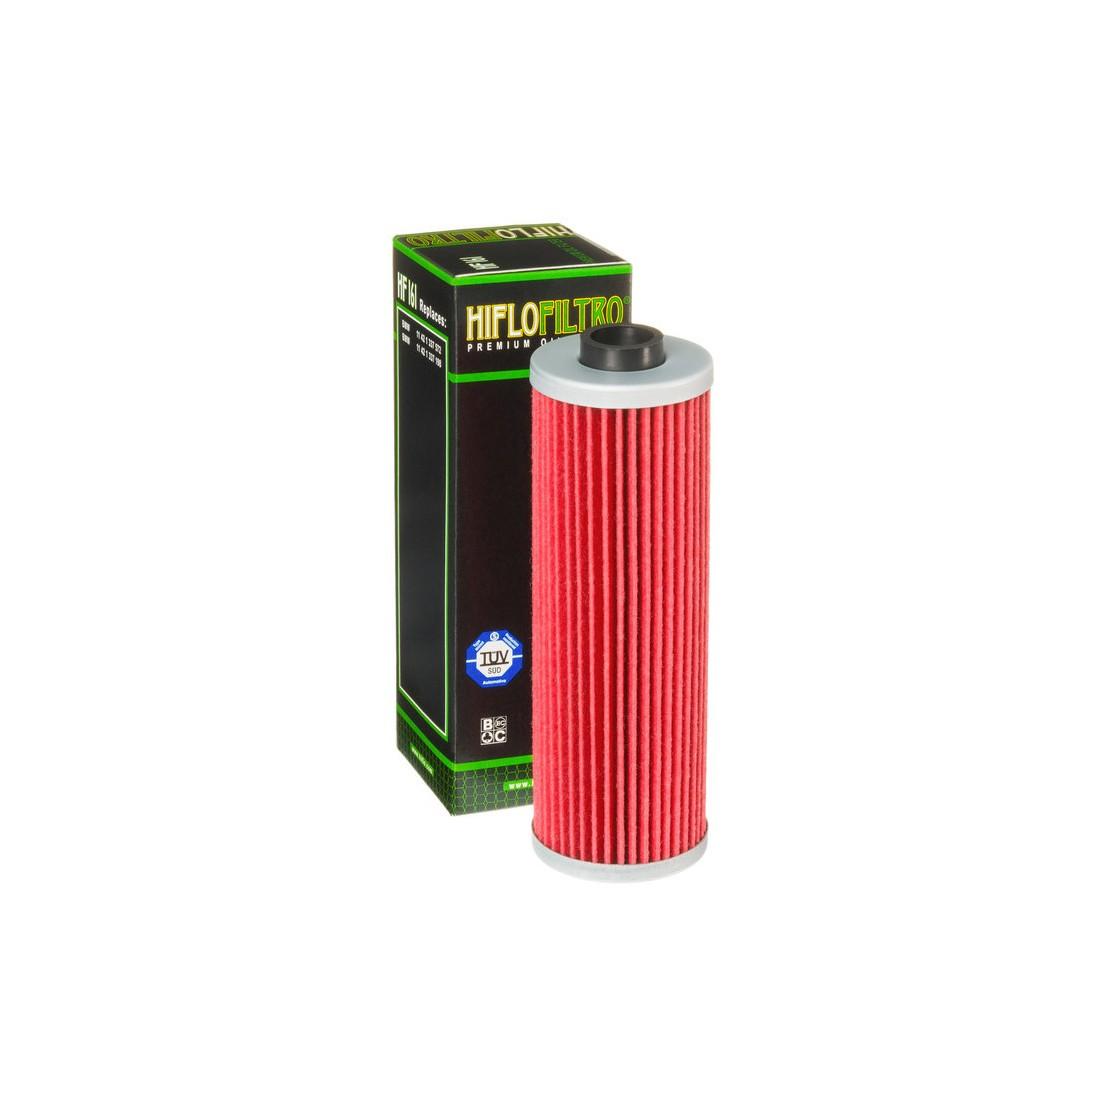 Filtro Aceite Hiflofiltro HF161